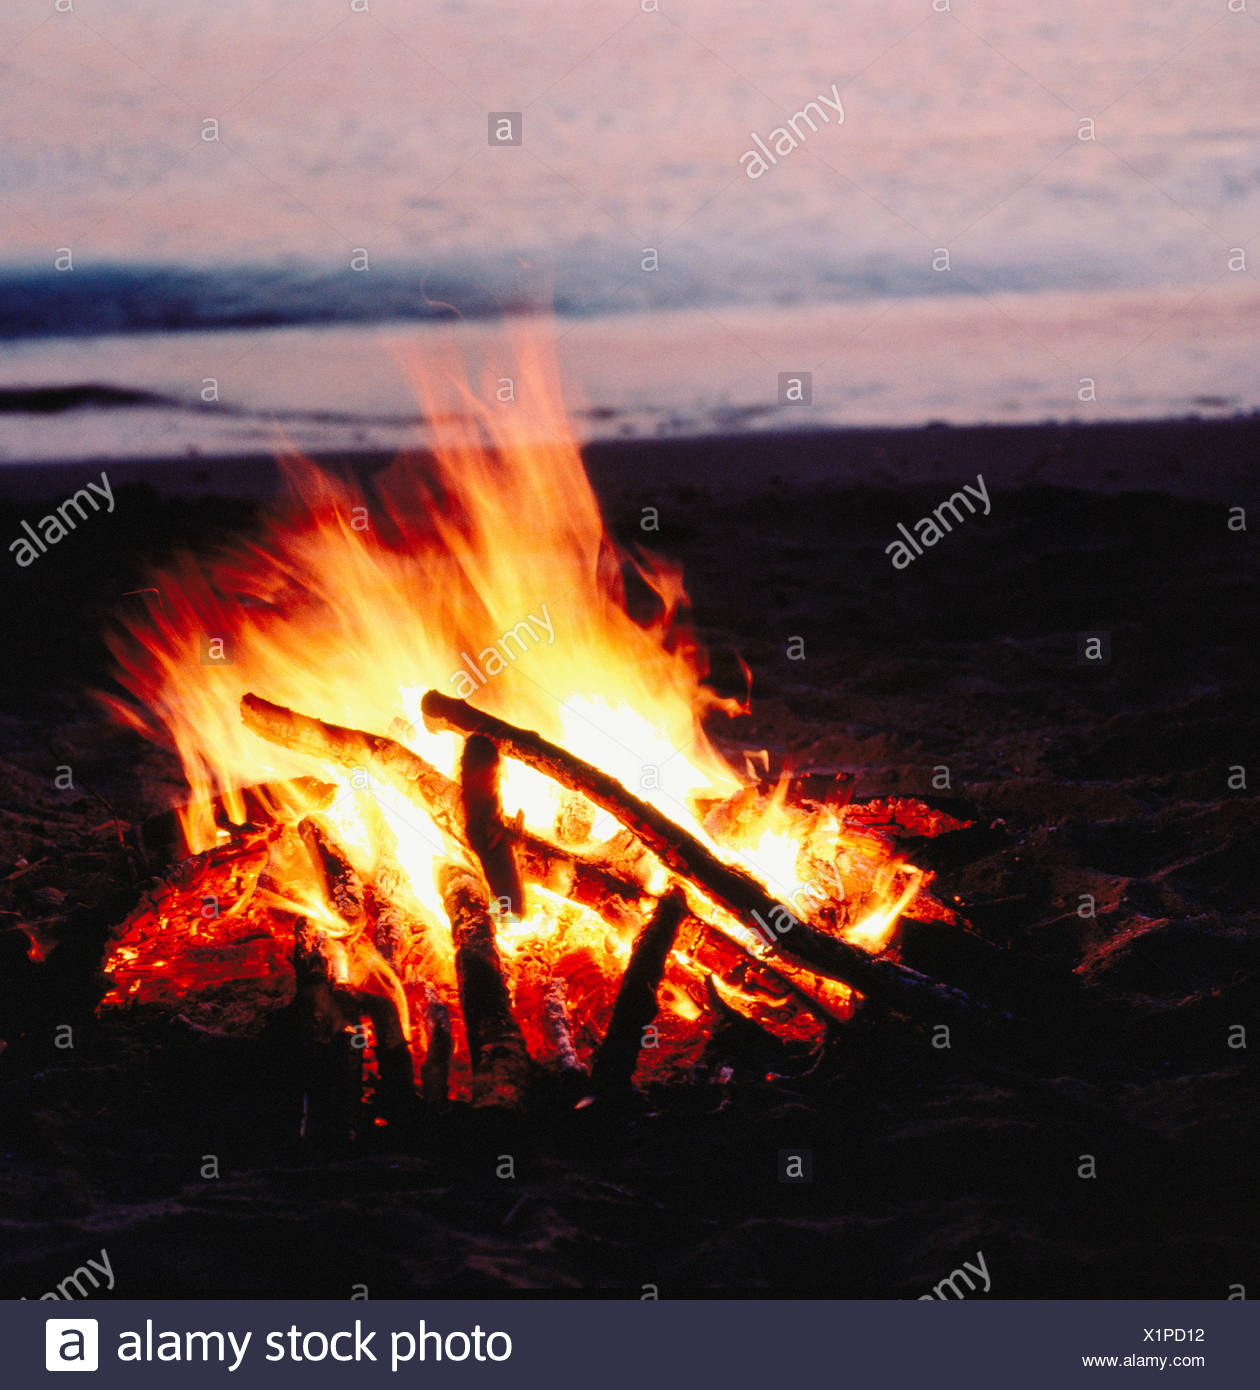 Feuer Kamin Flammen Lagerfeuer am Abend-Stimmung Stockbild